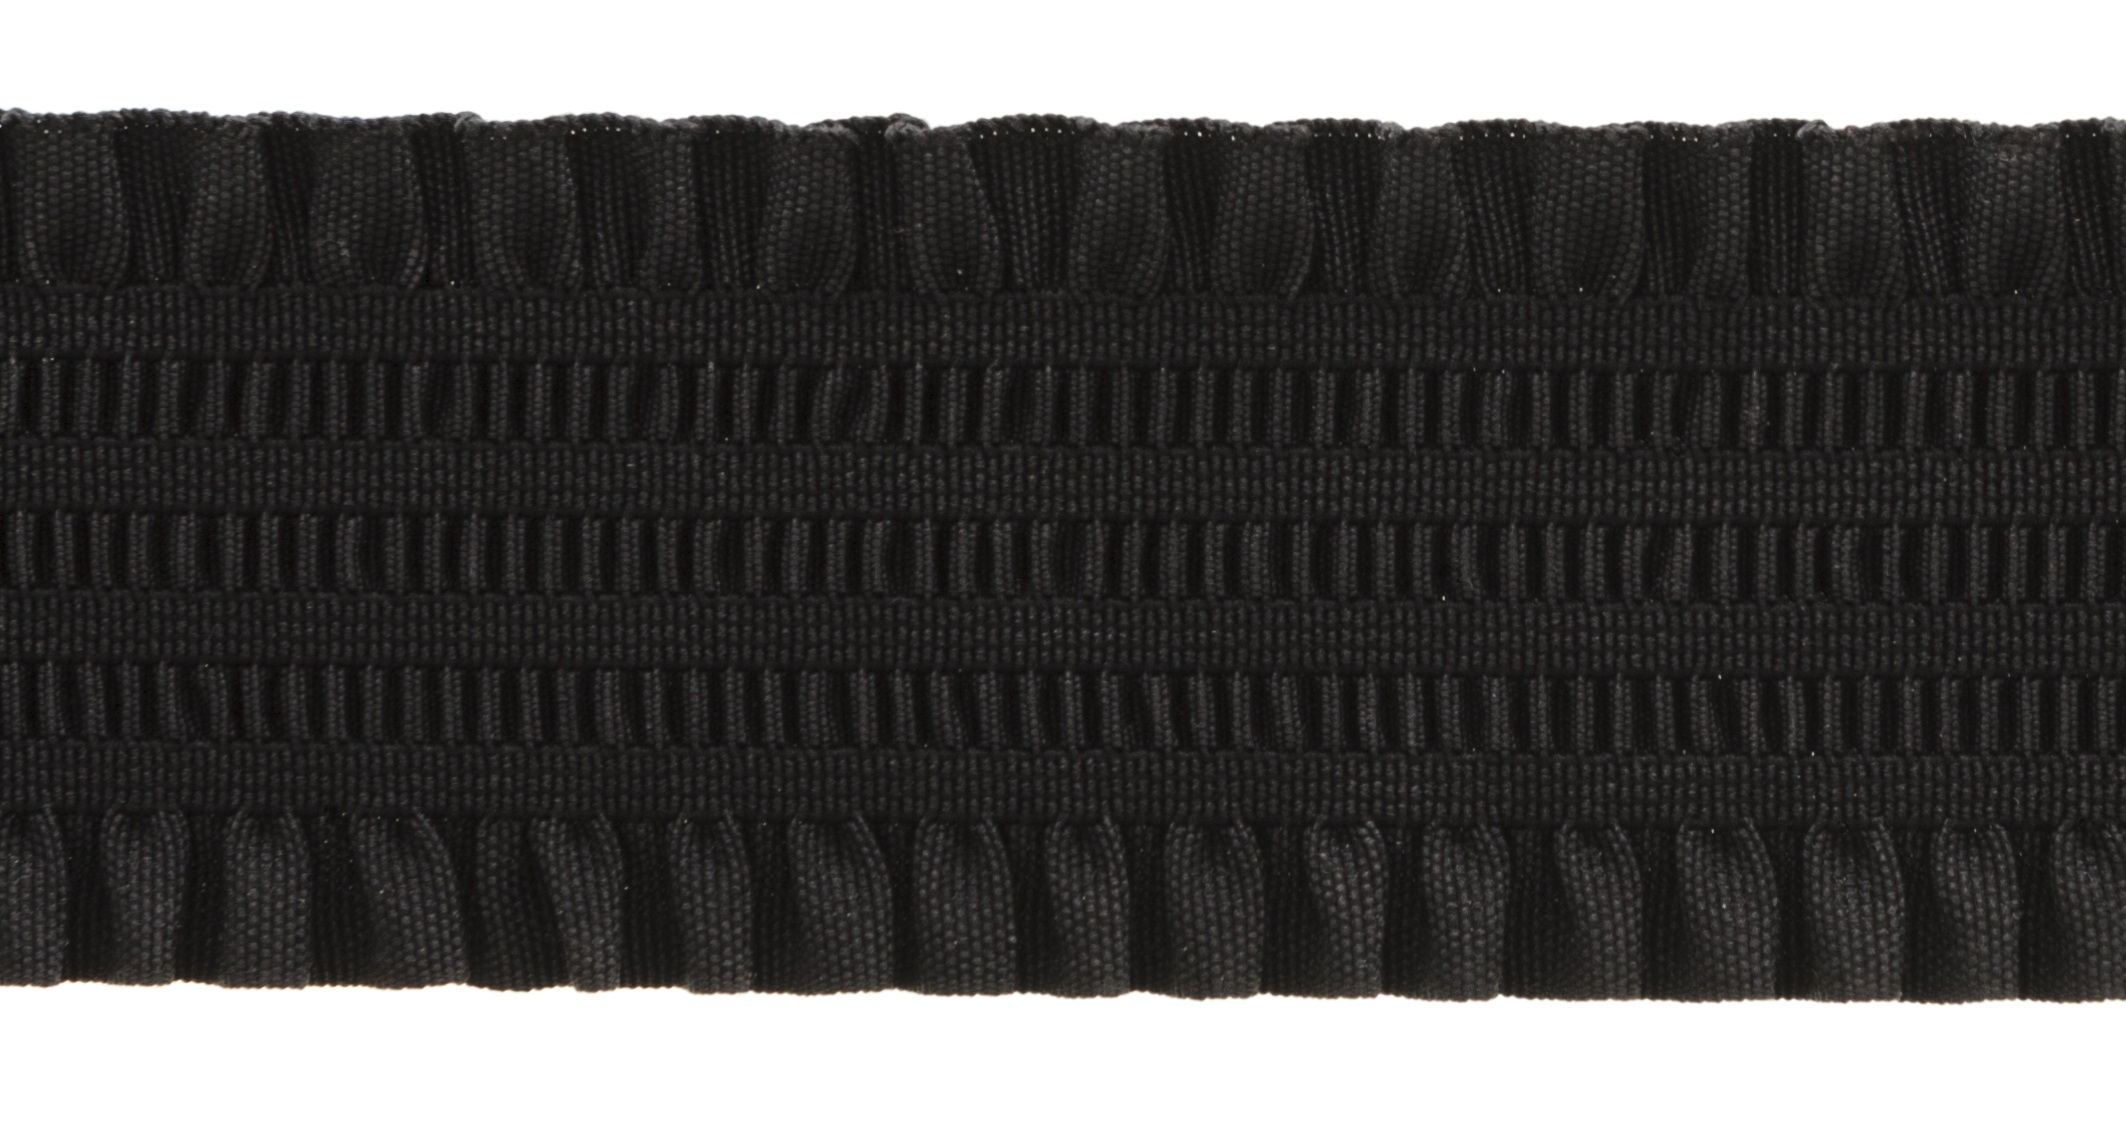 T 48 51mm Ruffled Elastic Band 9 1m Product Detail Philip Stamp Amp Co Ltd